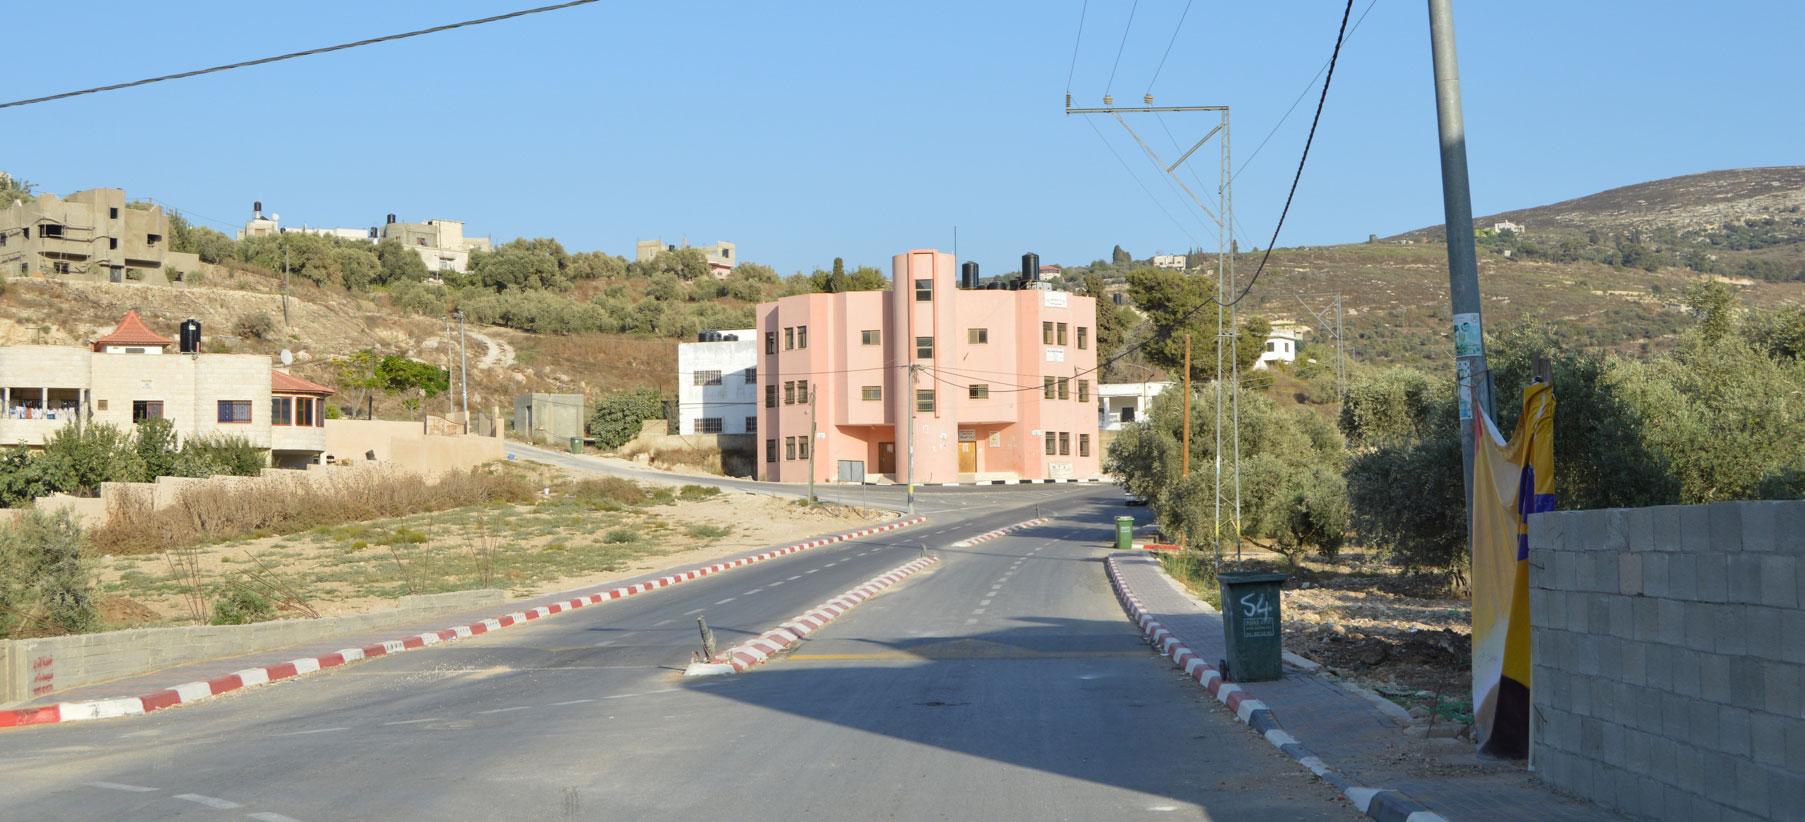 Araqa - Palestine